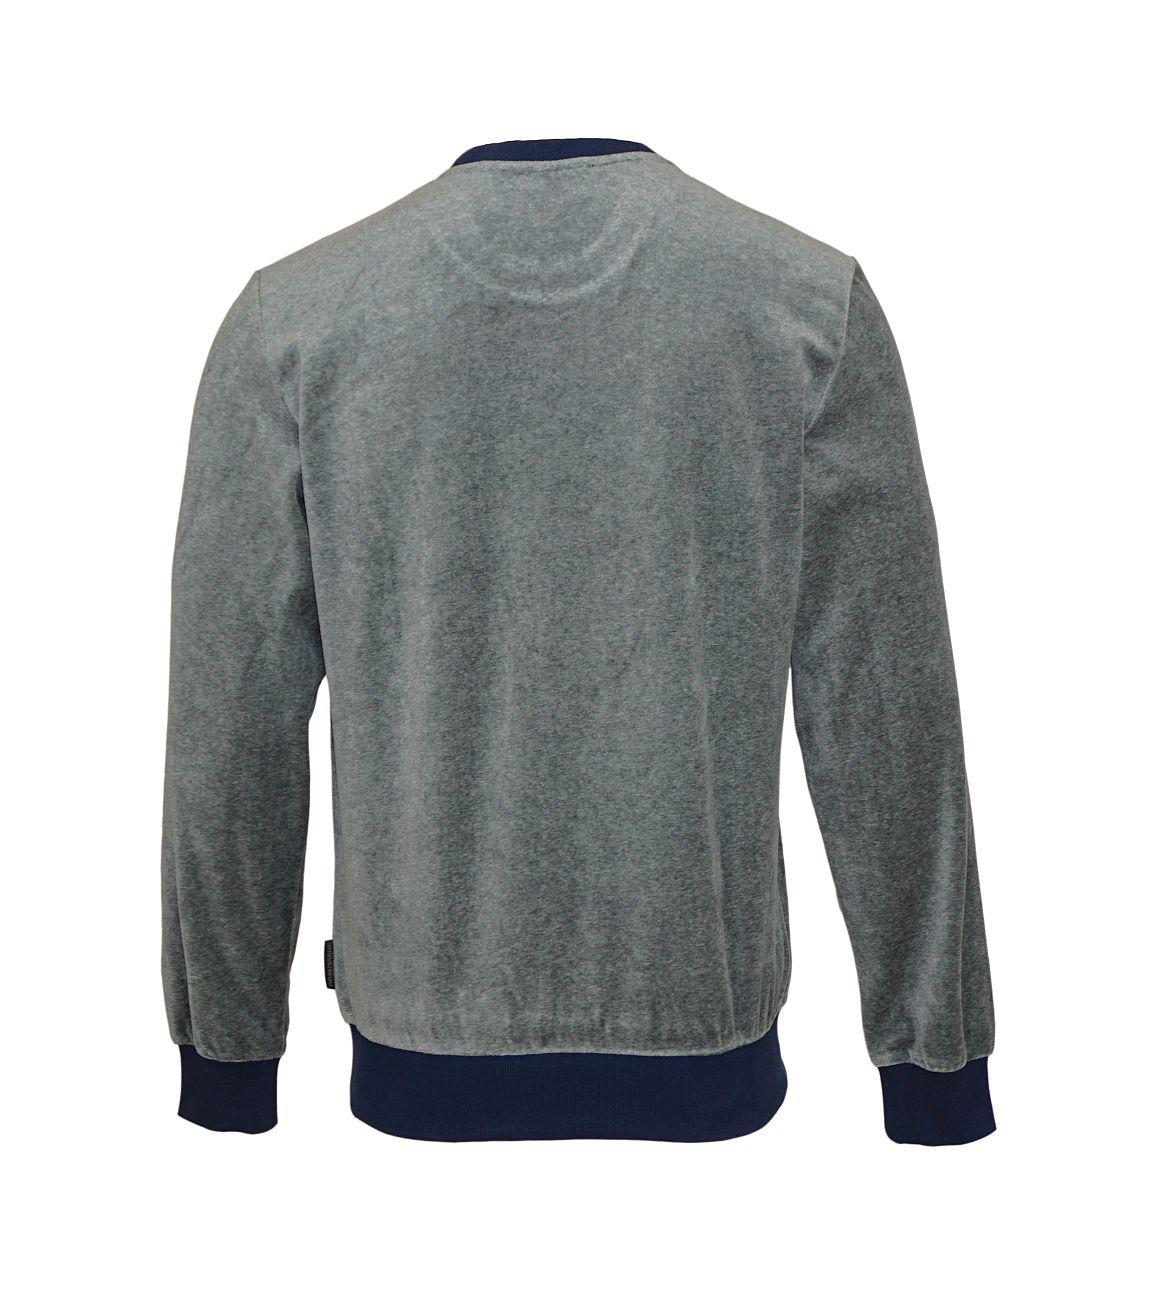 Emporio Armani Sweater Pullover Rundhals 111785 8A589 06749 GRIGIO MELANGE SCURO WX18-EAS